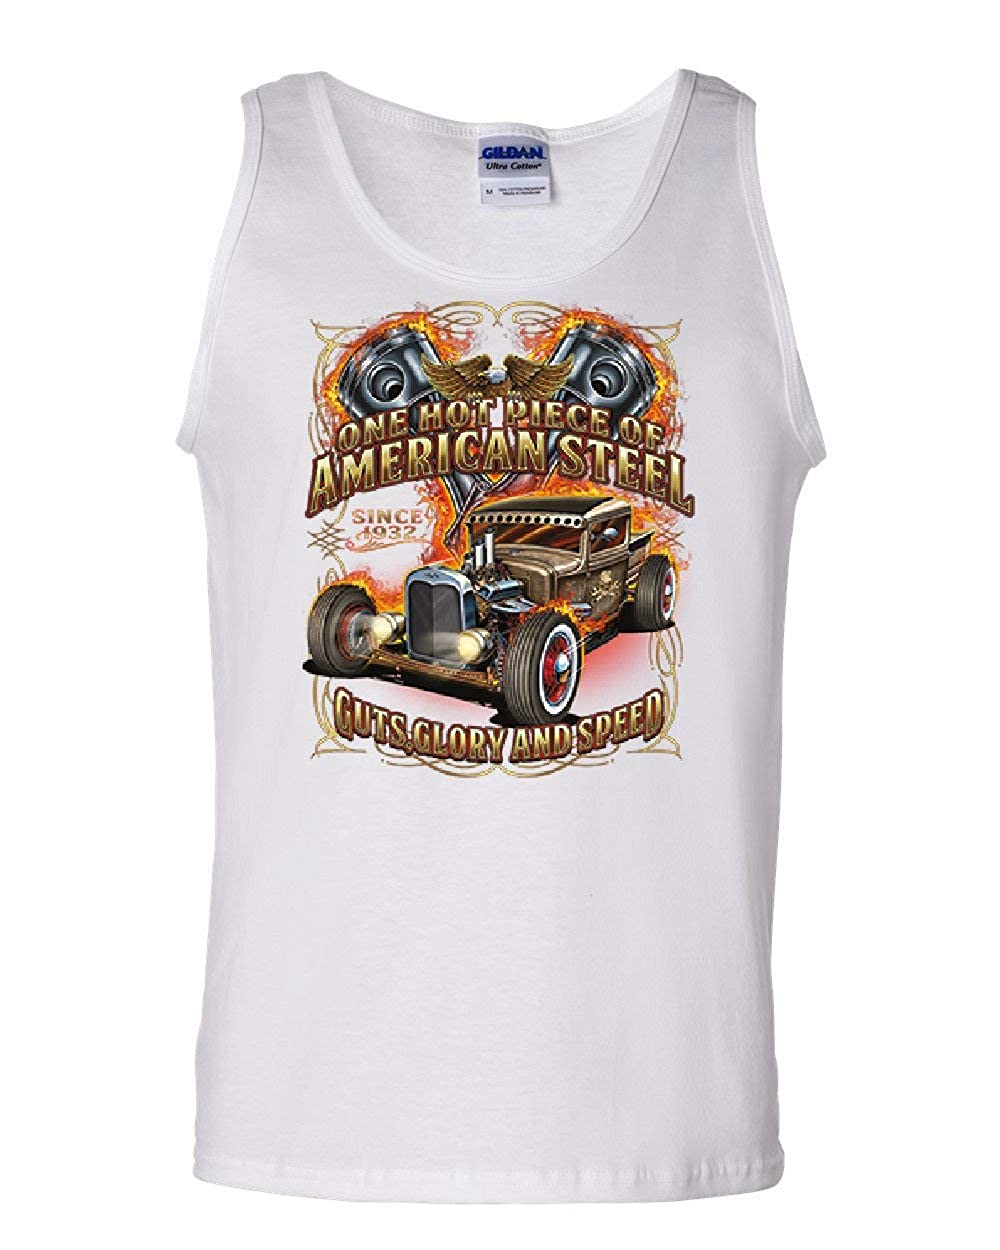 One Hot Piece of American Steel Tank Top Hot Rod Guts Glory Speed Sleeveless